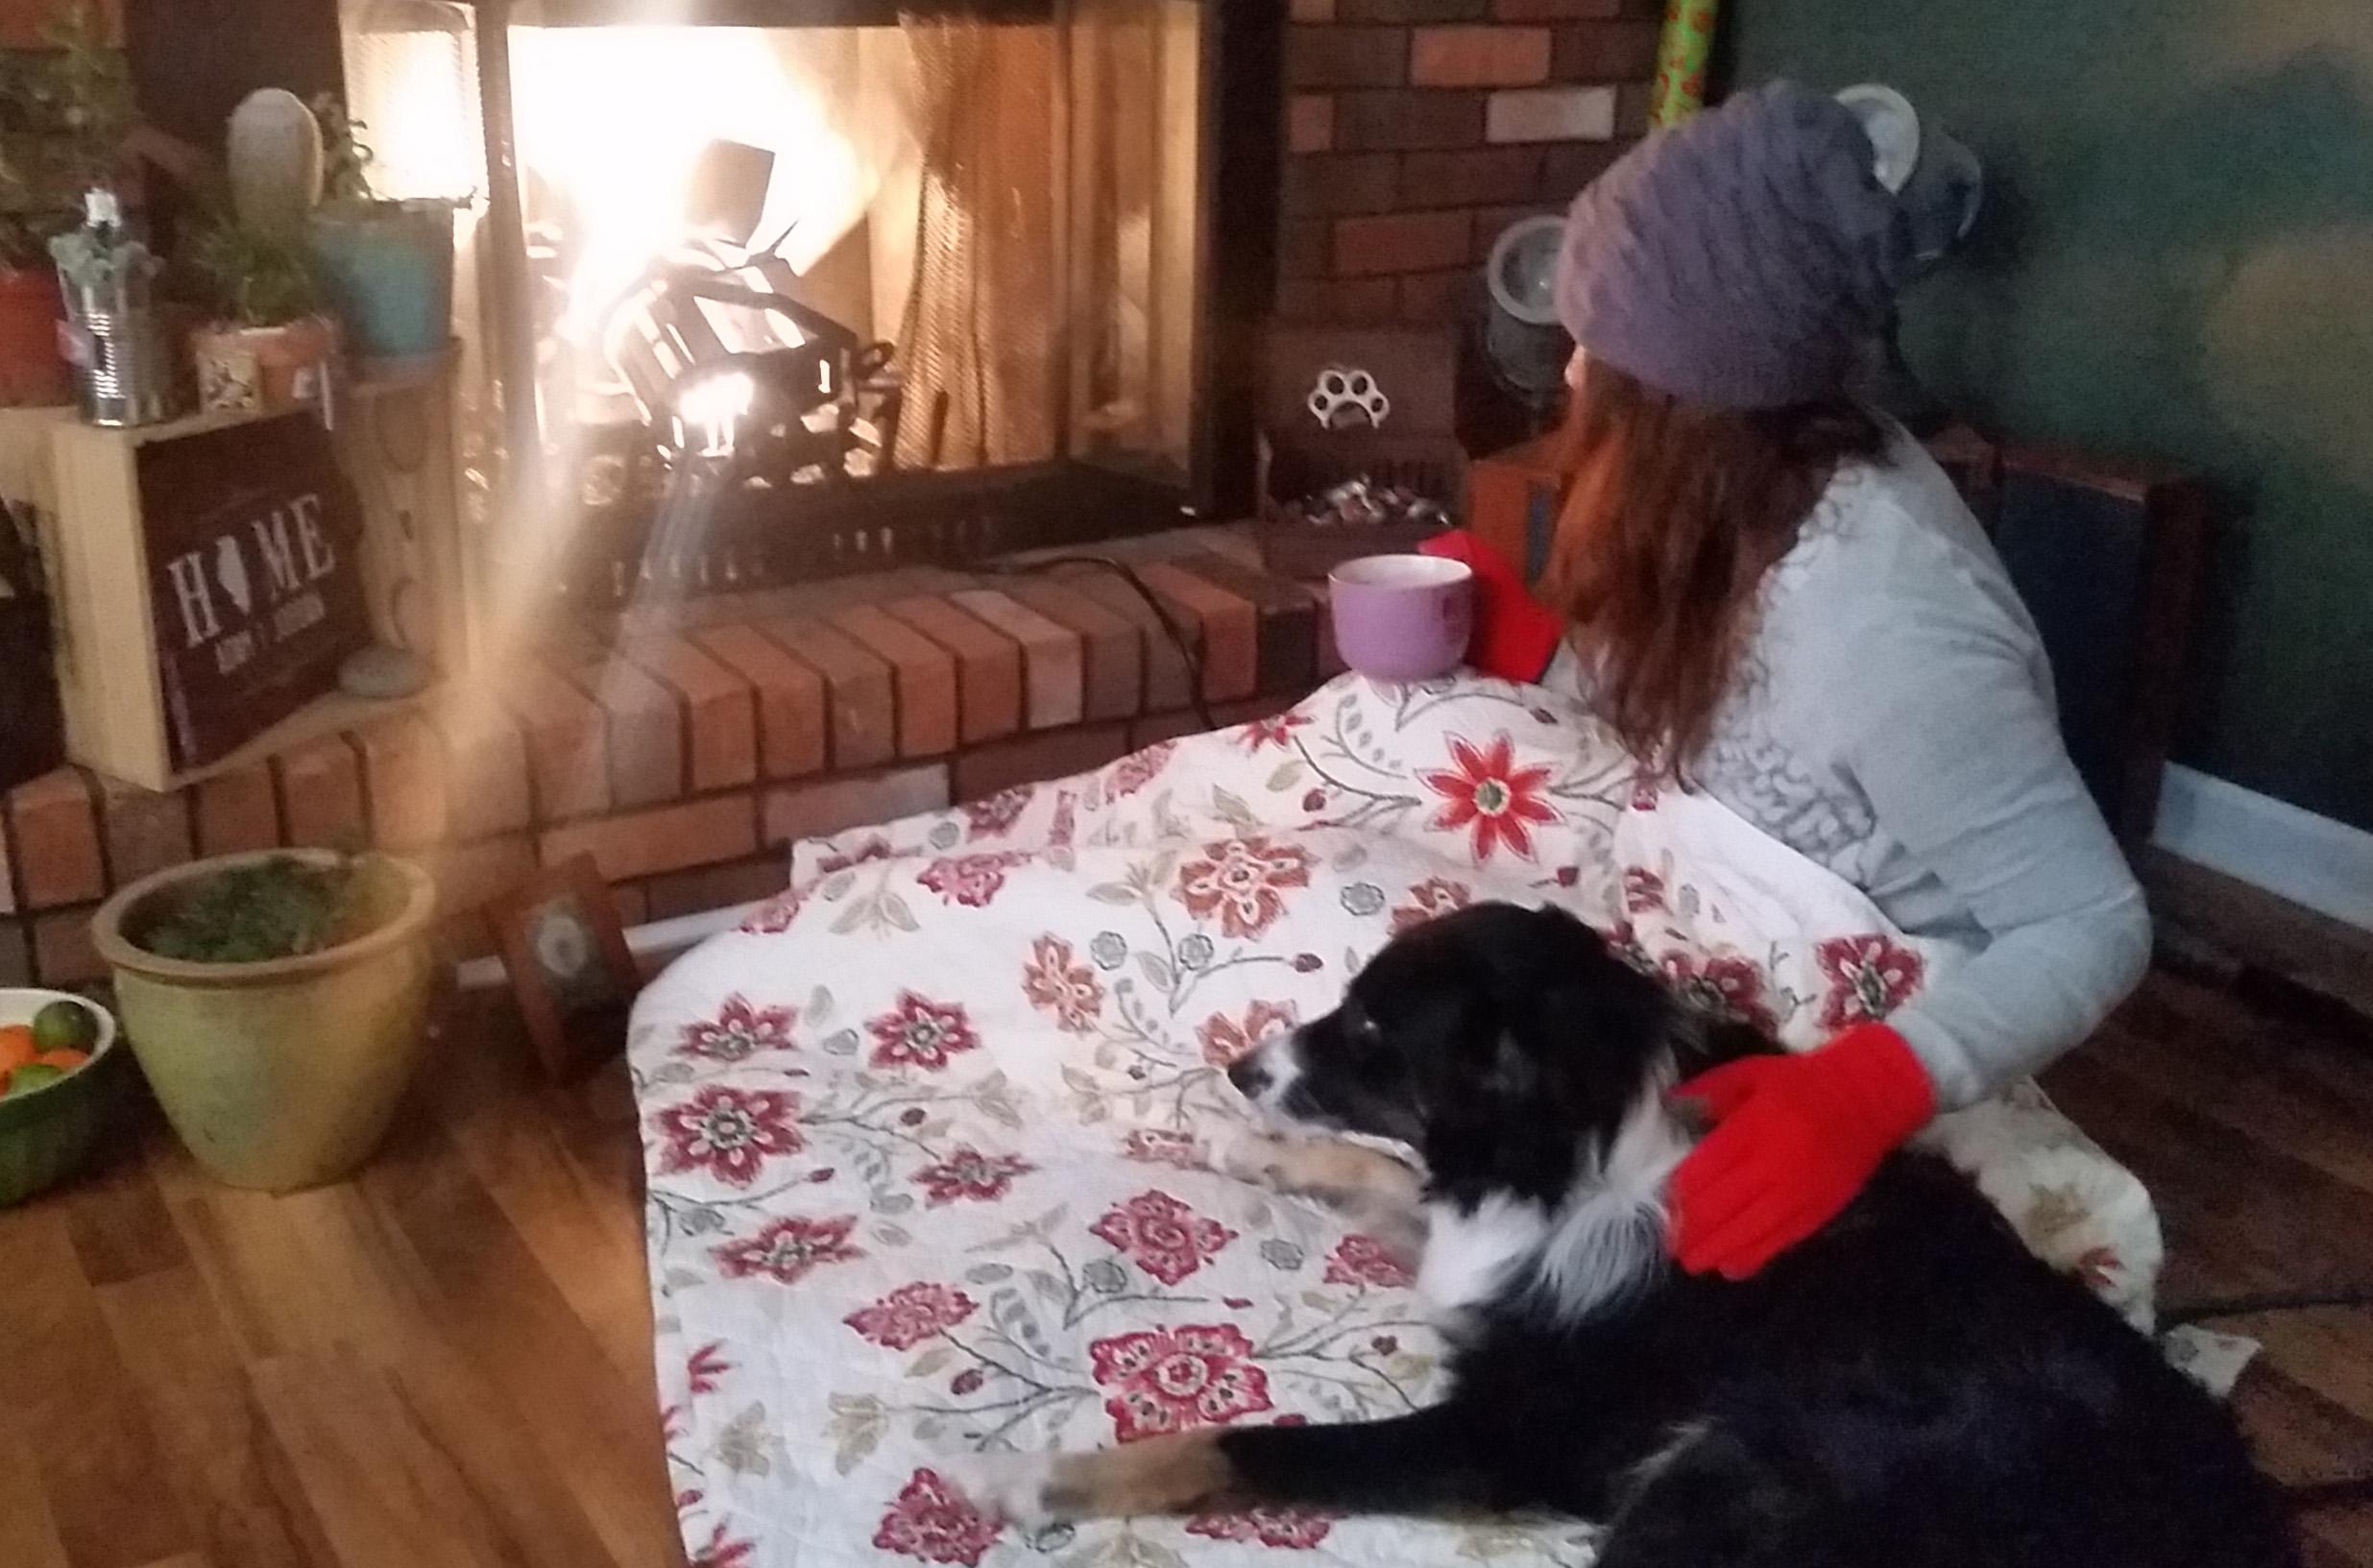 Fireplace Light Pic for WEB.jpg